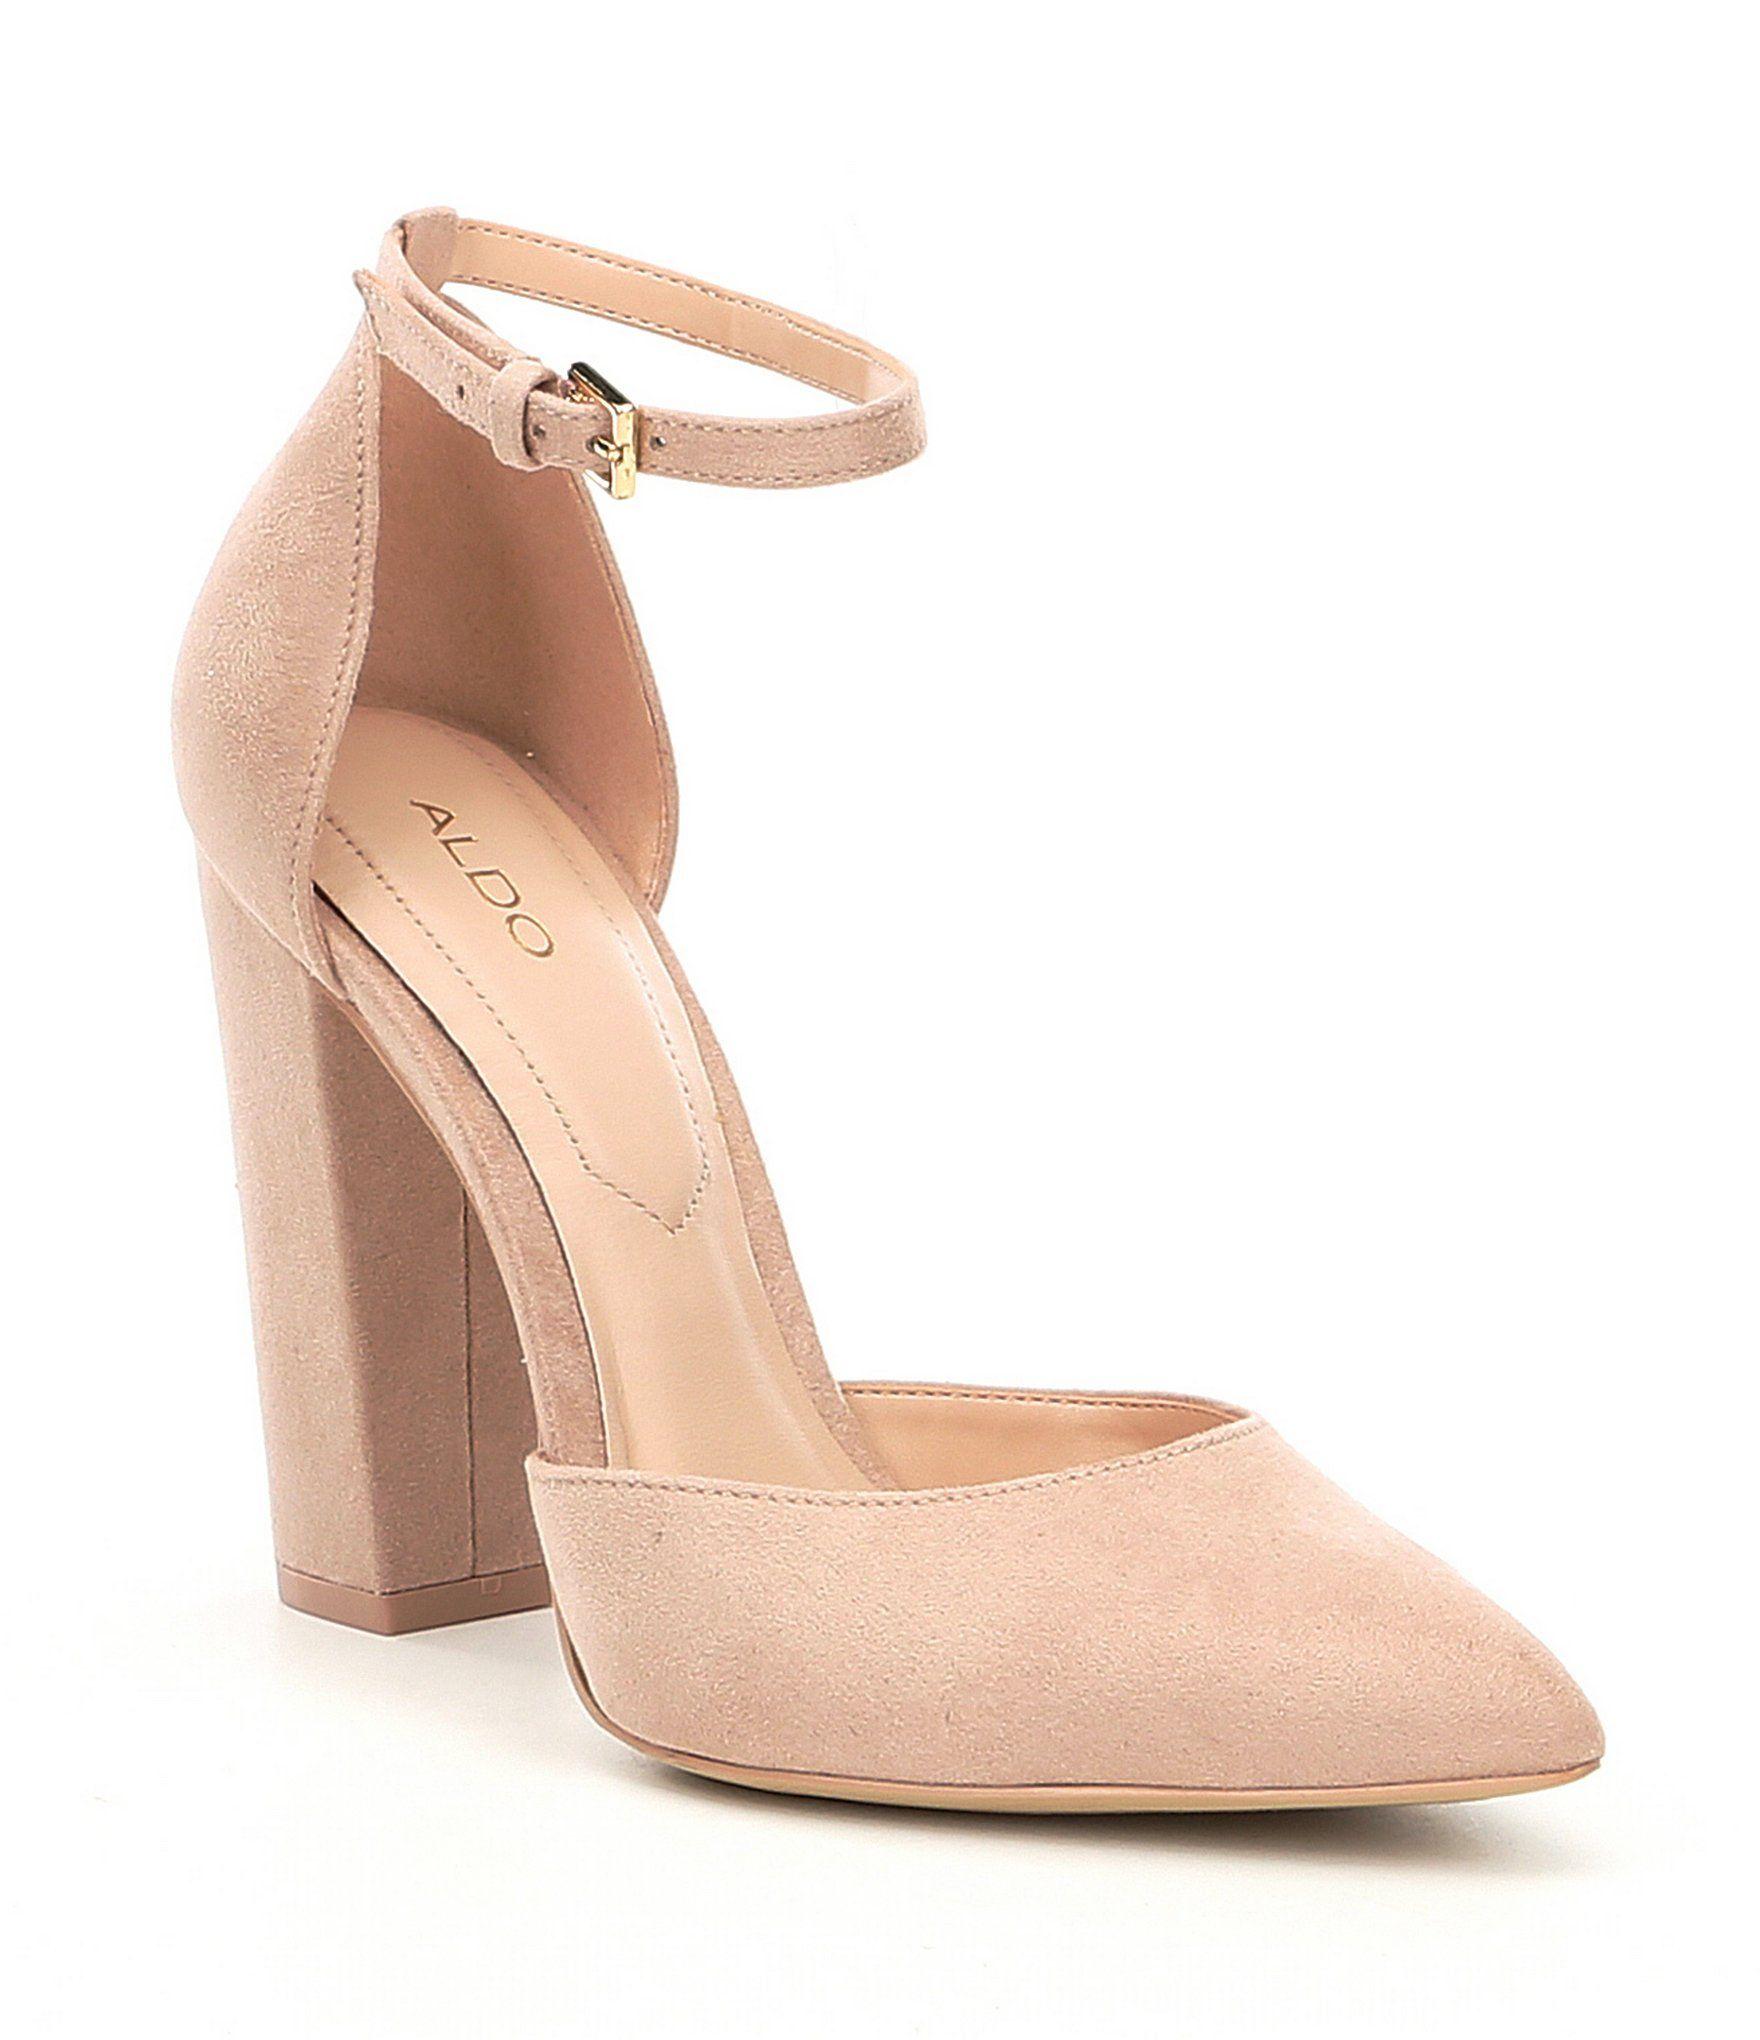 pindaniela kottke on mother of the bride | heels, block